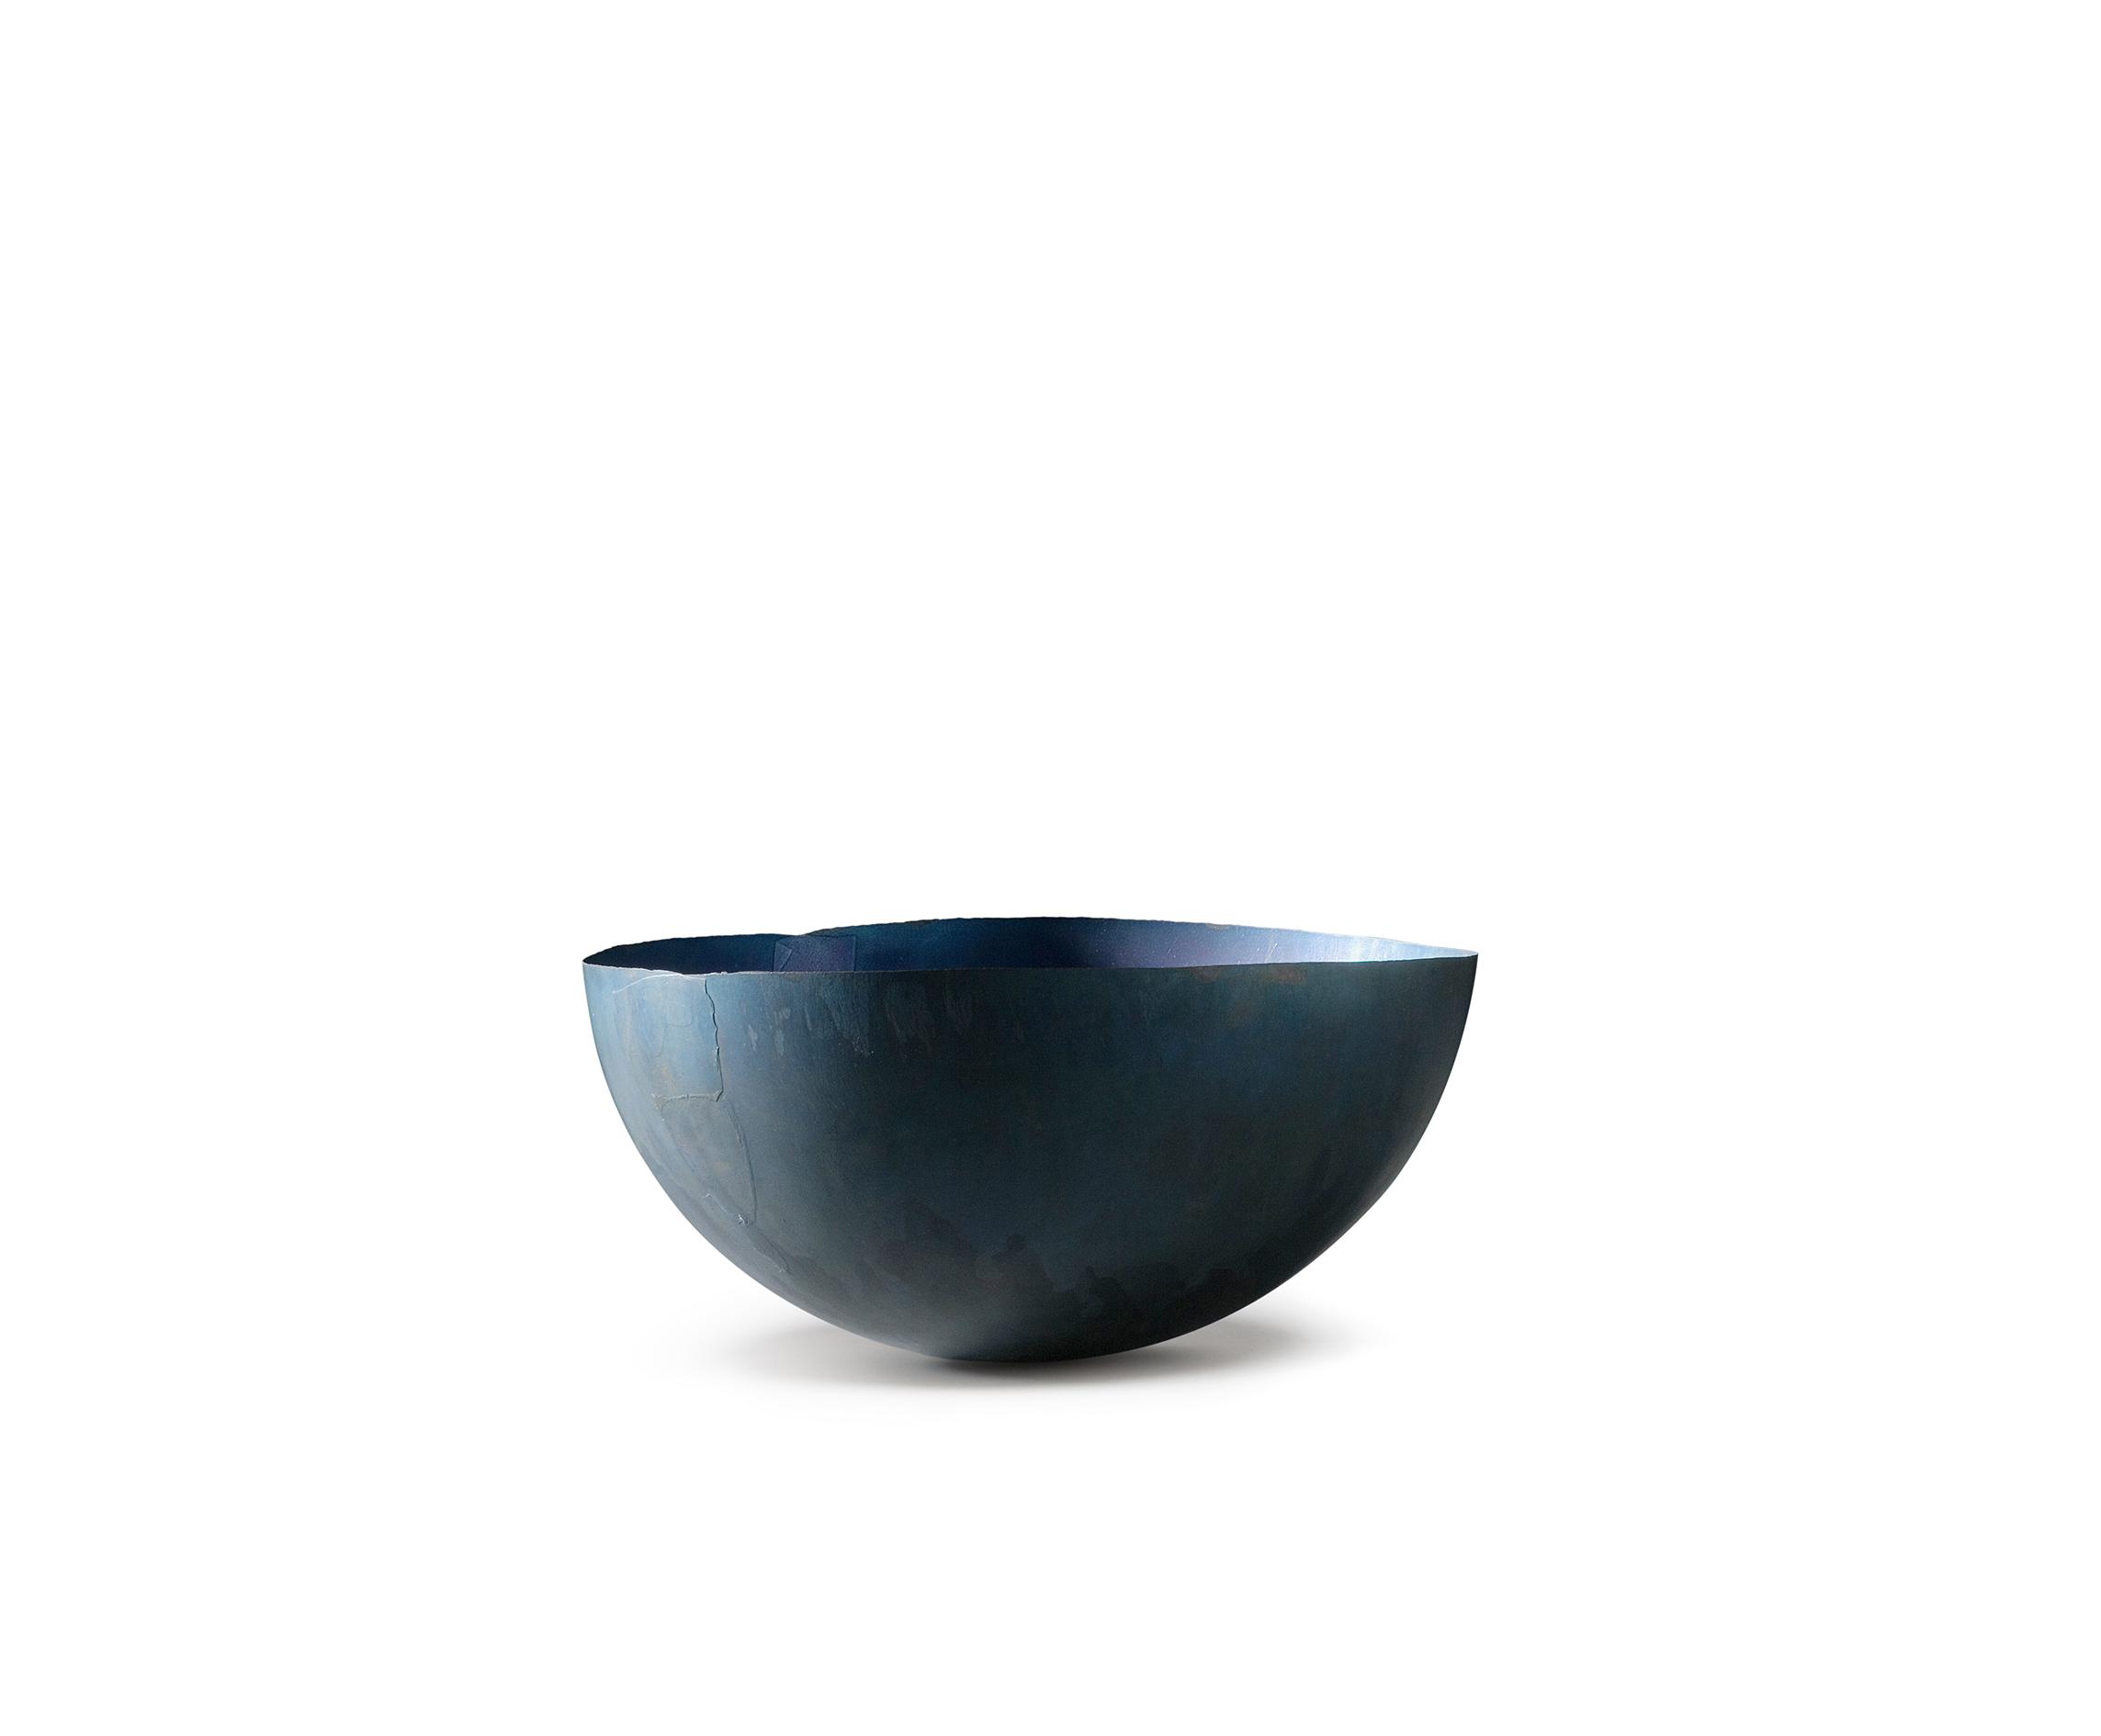 "Laurenz Stockner, Italy ""Bowl made of copper / elastic shape – Ø 200mm"", copper, 200 x 200 x 100 mm (2012)"